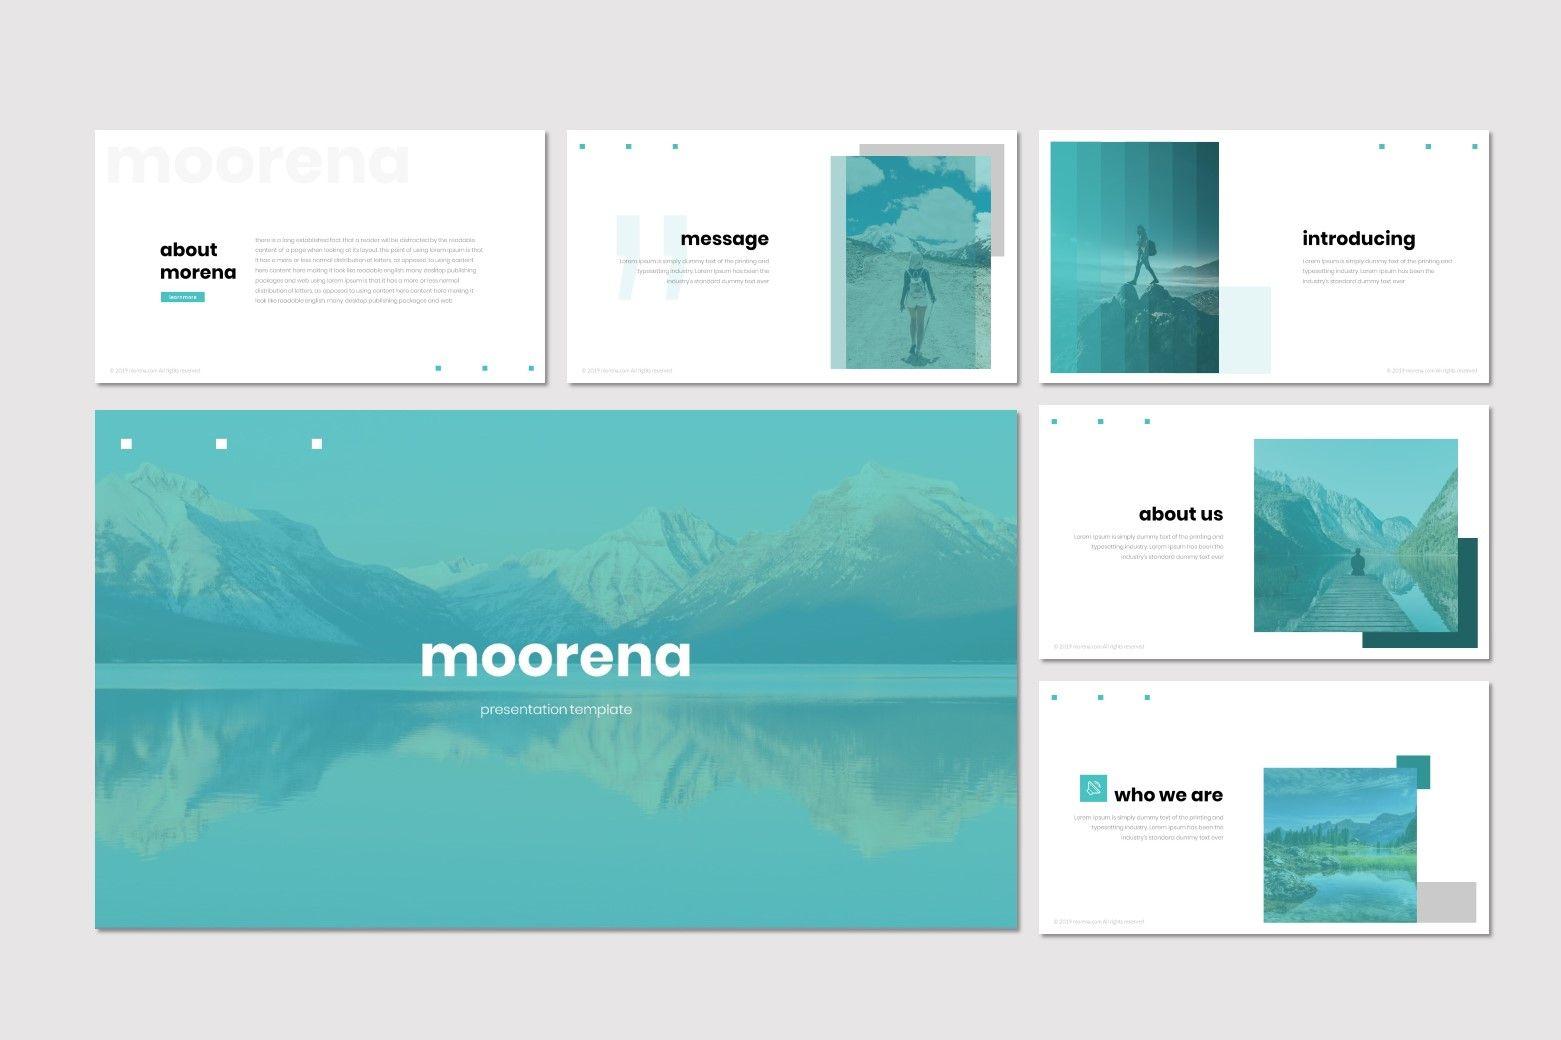 Moorena - PowerPoint Template, Slide 2, 07261, Presentation Templates — PoweredTemplate.com